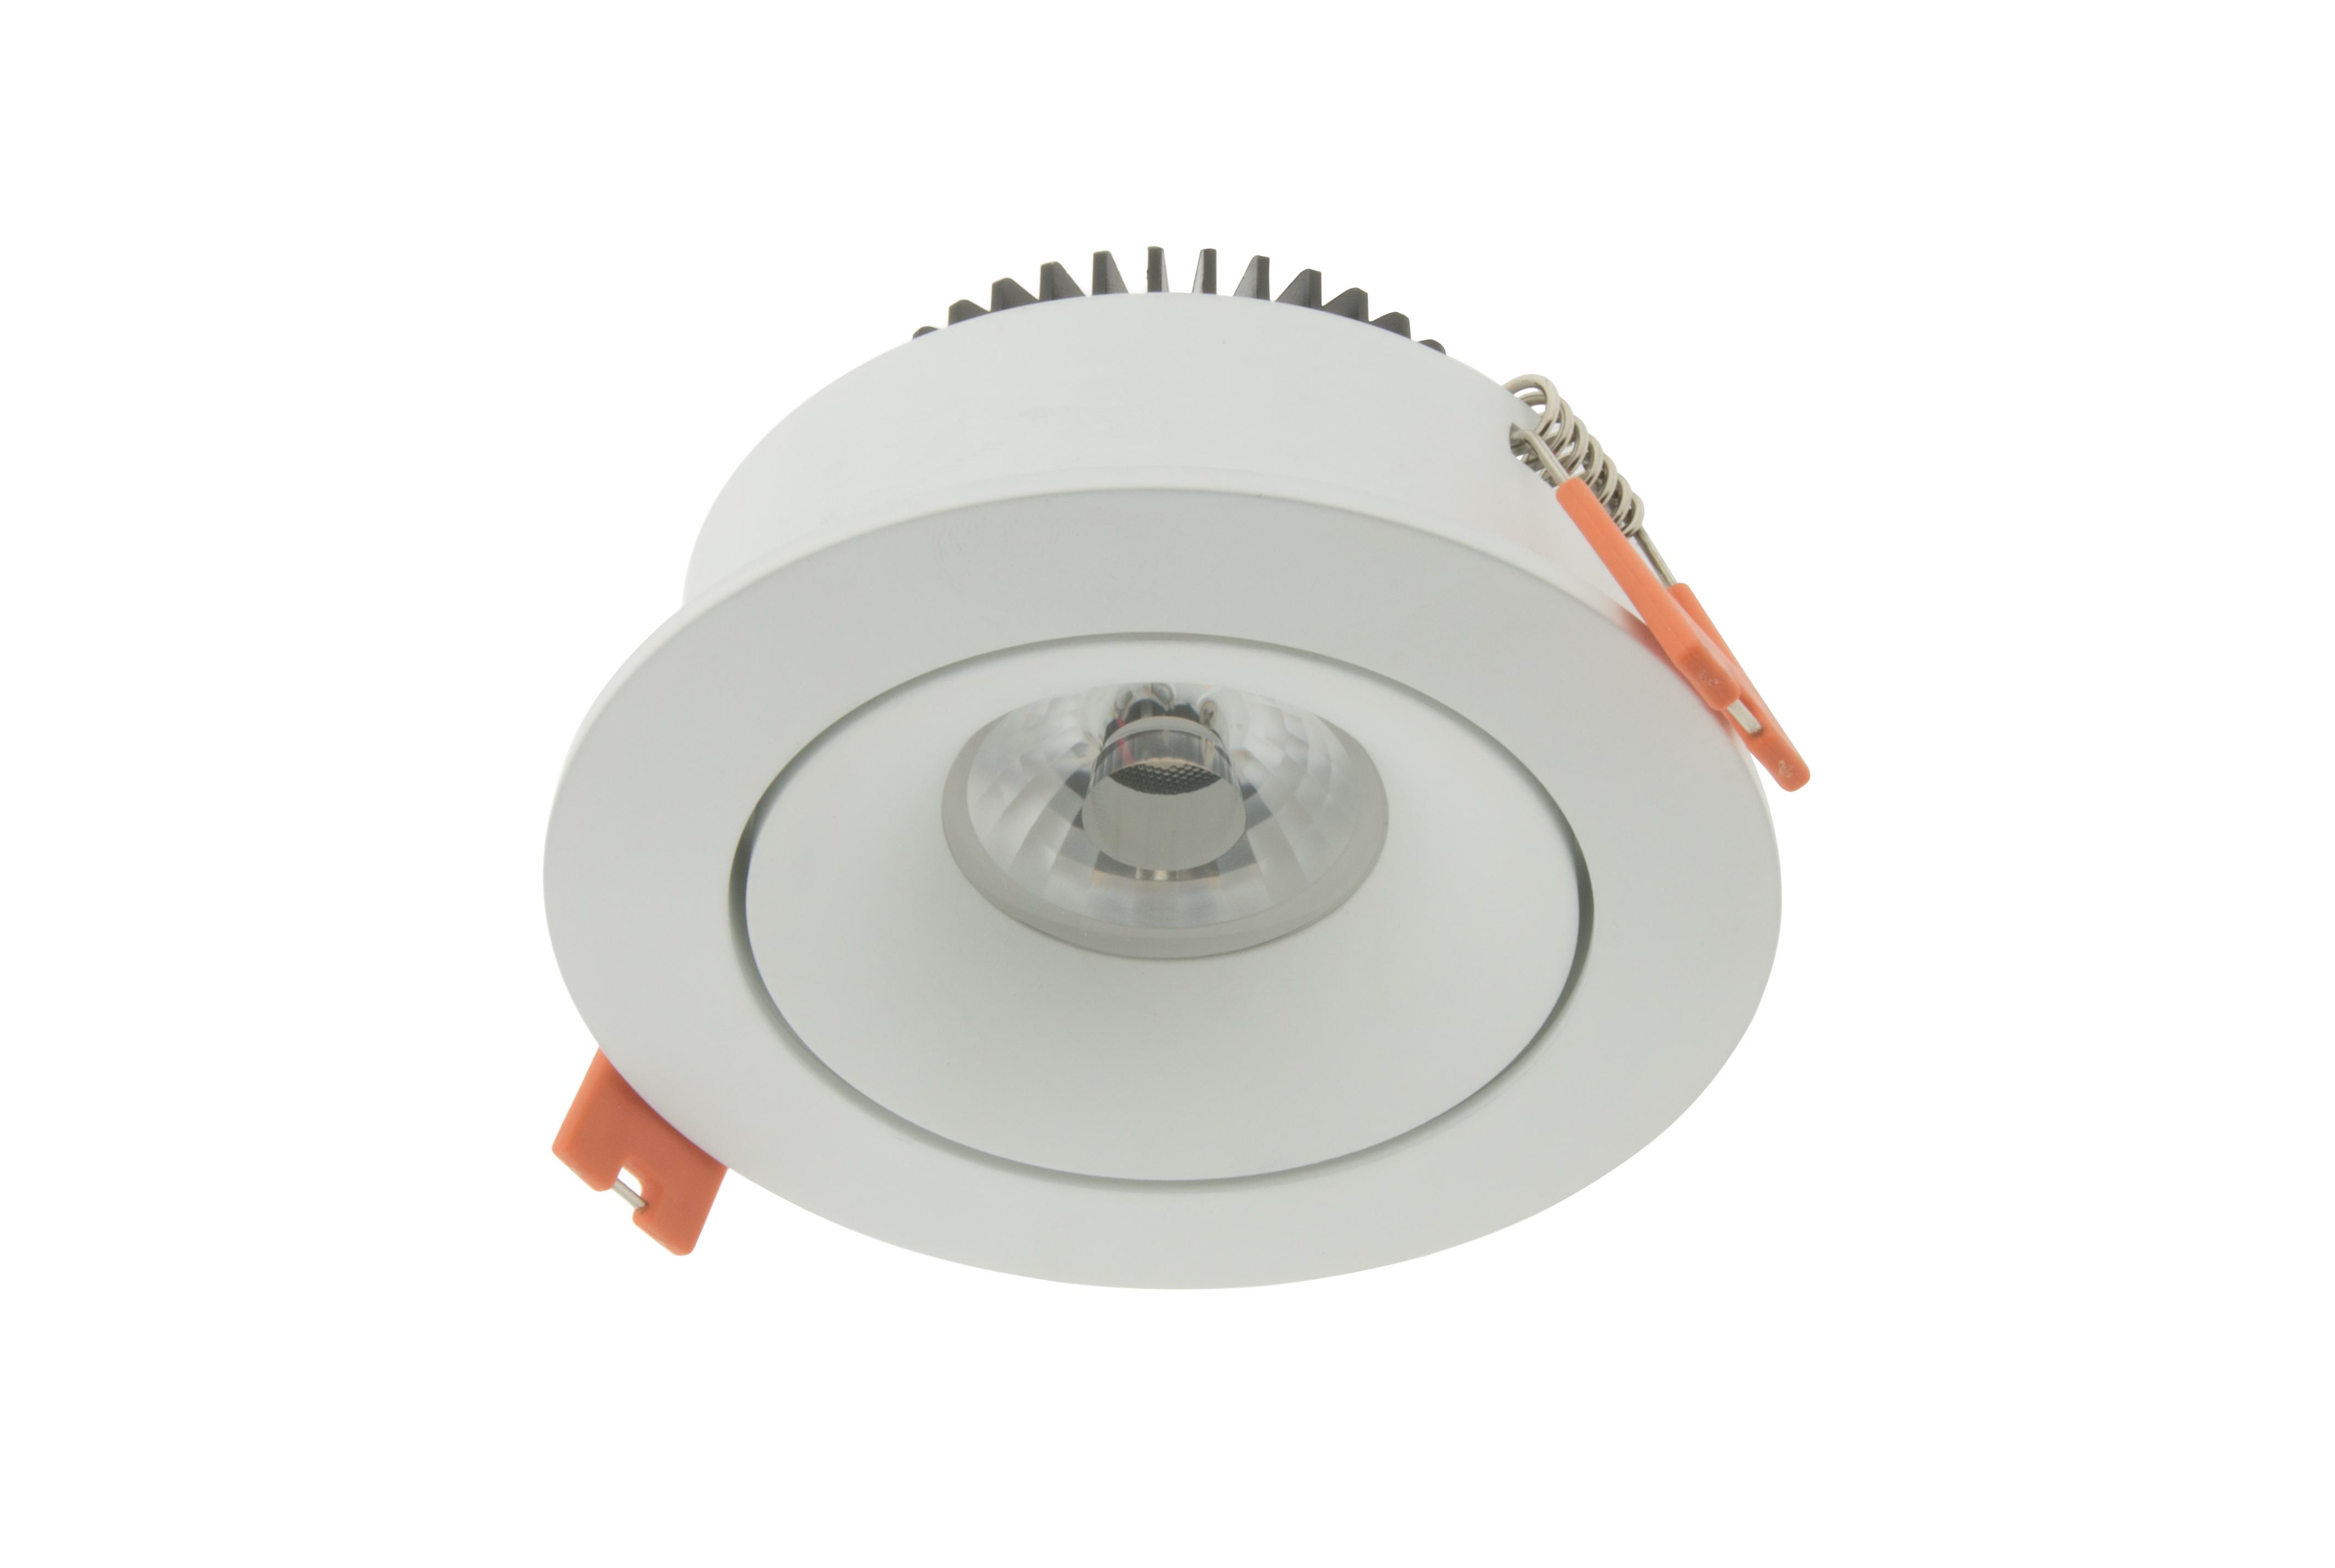 1 Stk LED Downlight 100 - IP43 | CRI/RA 97 (Kardanisch) Warmweiß LILD100236